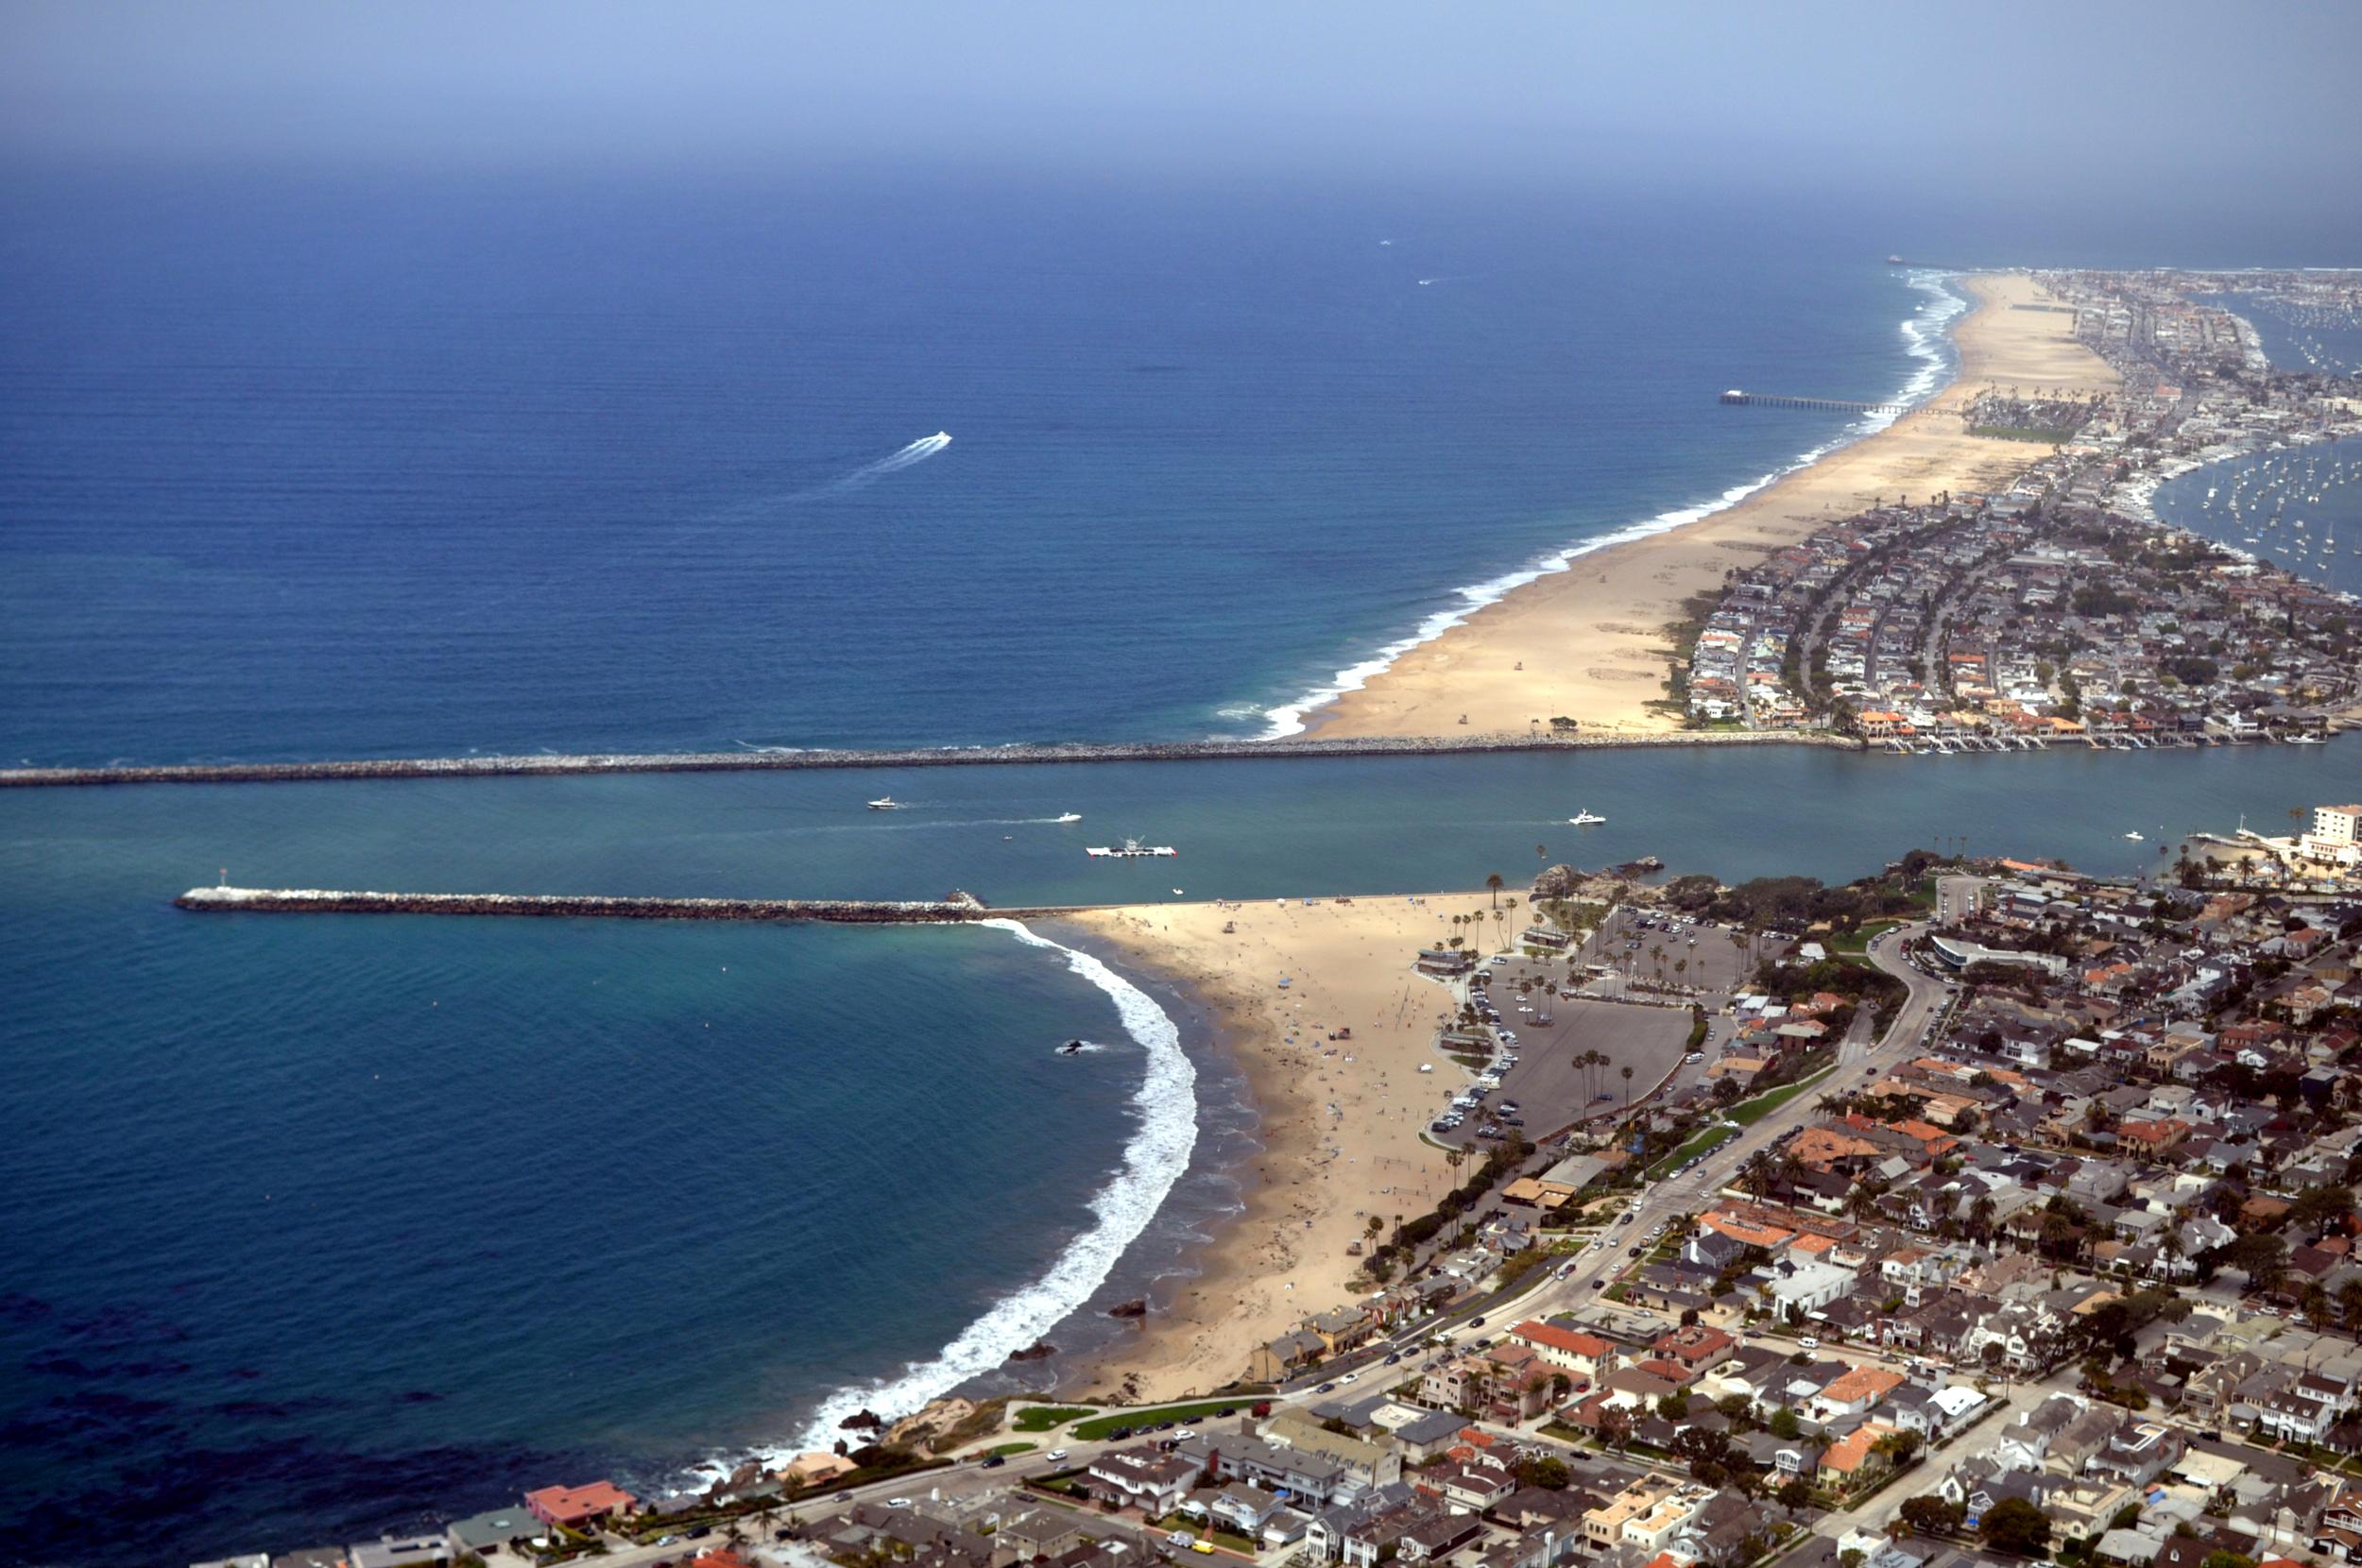 Corona_del_Mar_State_Beach_Photo_D_Ramey_Logan.jpg